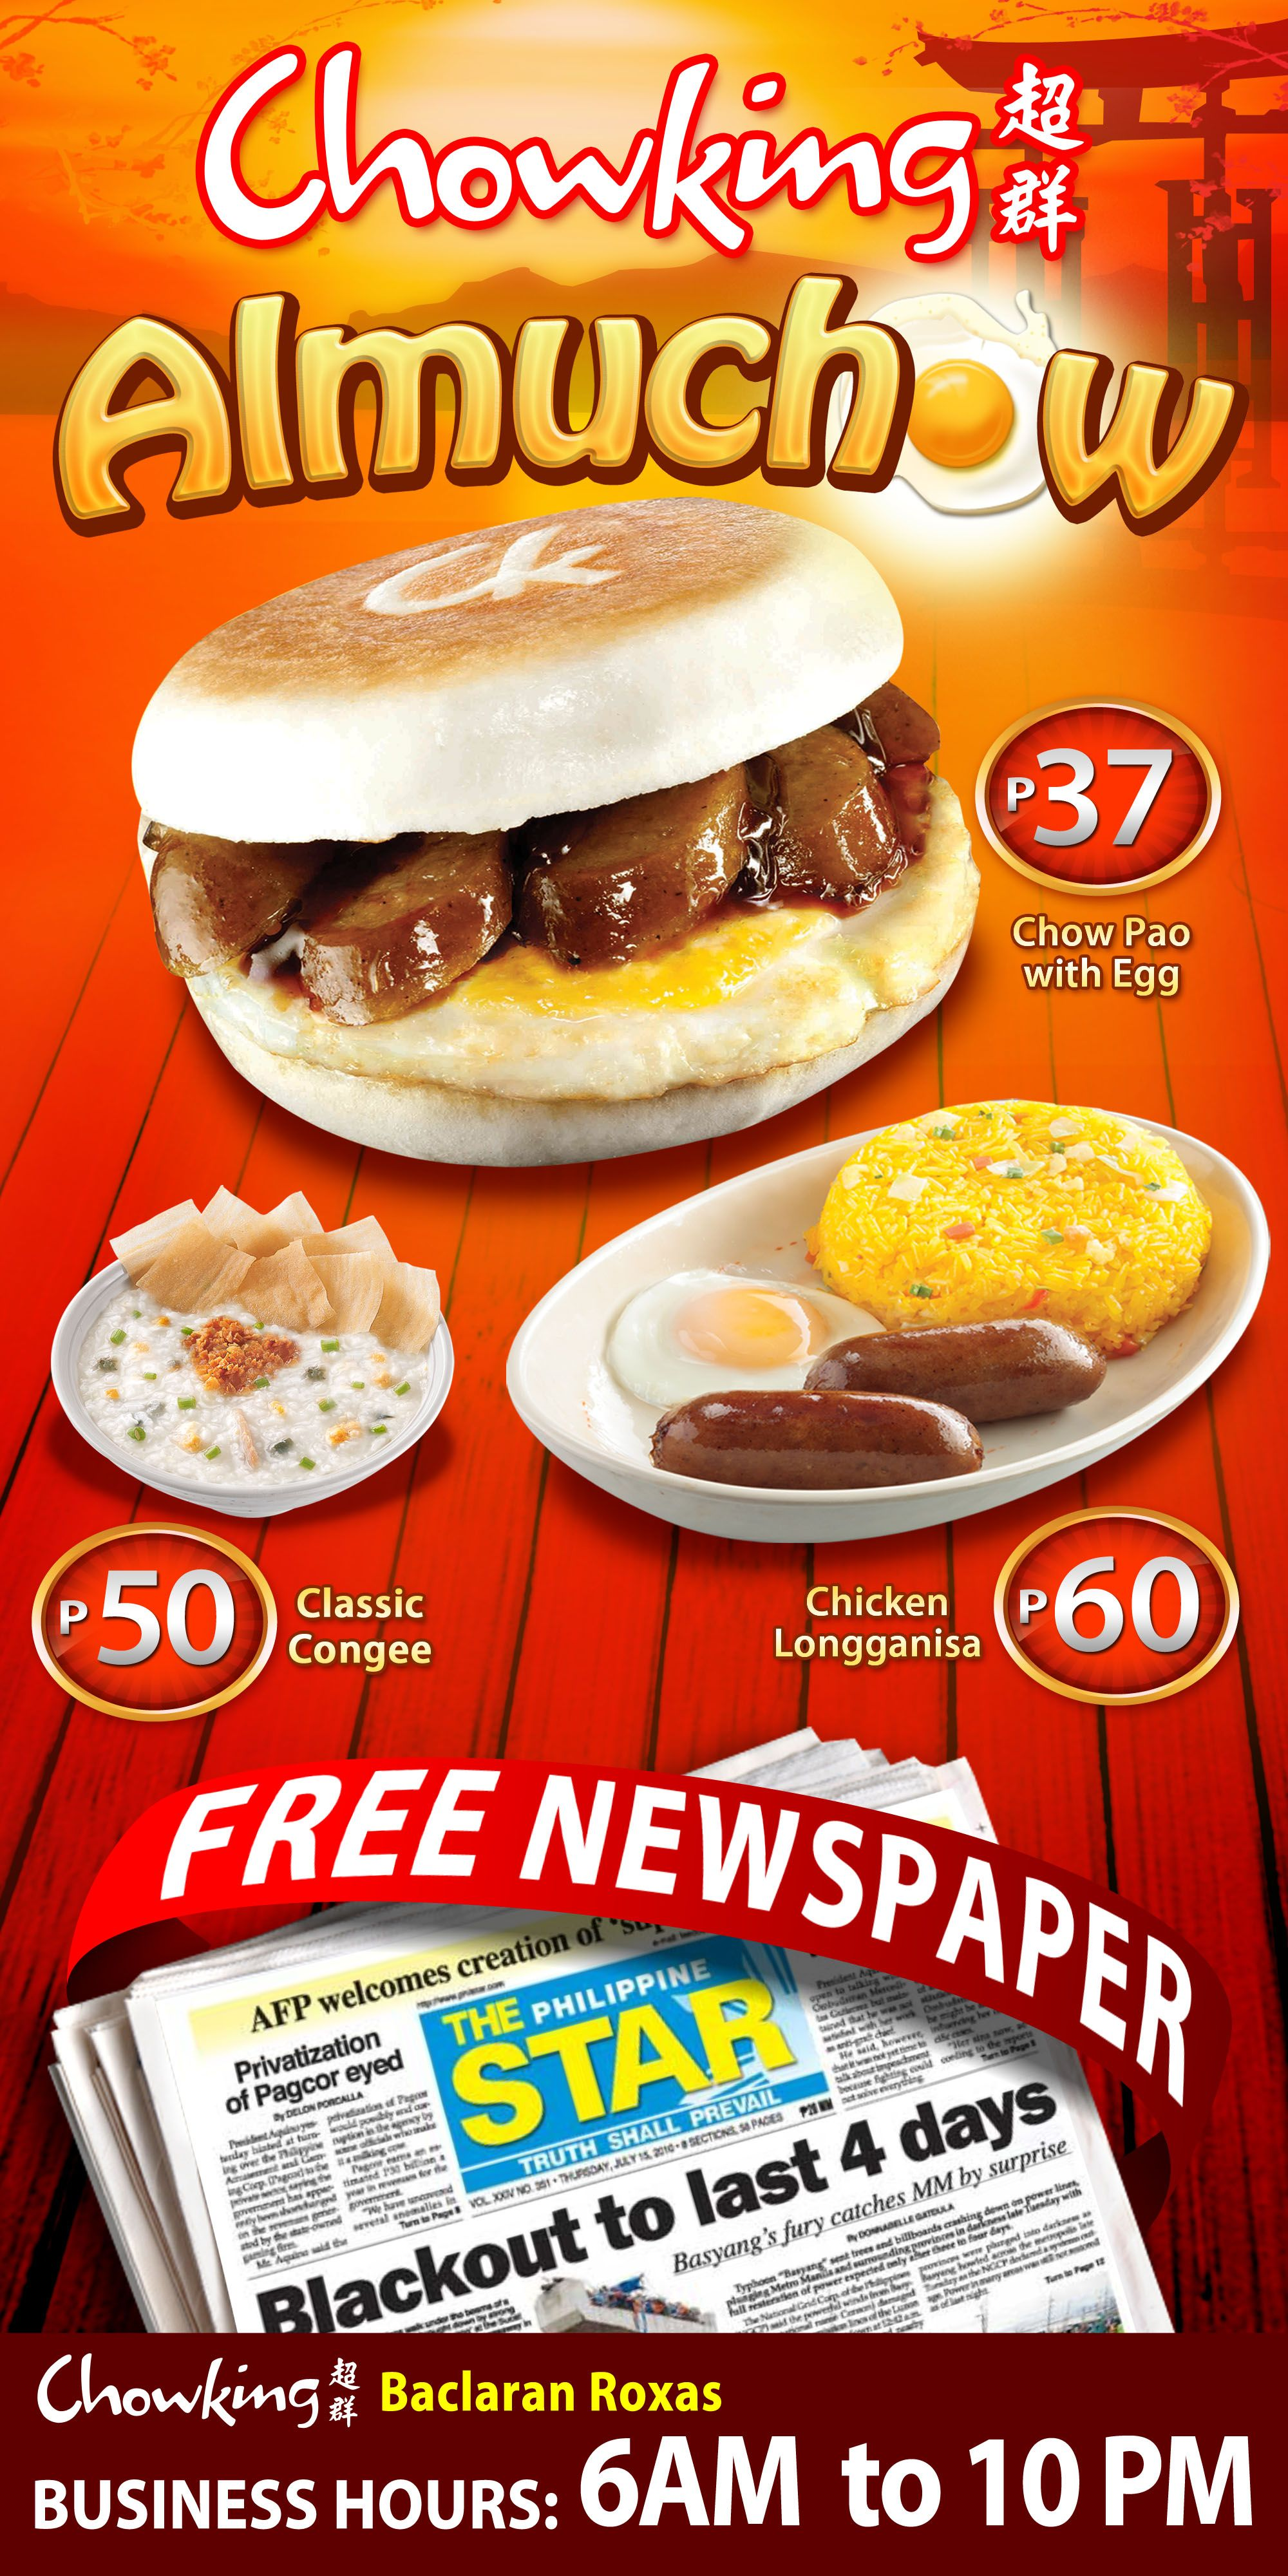 fa banner almuchow 3x6feet chowking Hot dog buns, Food